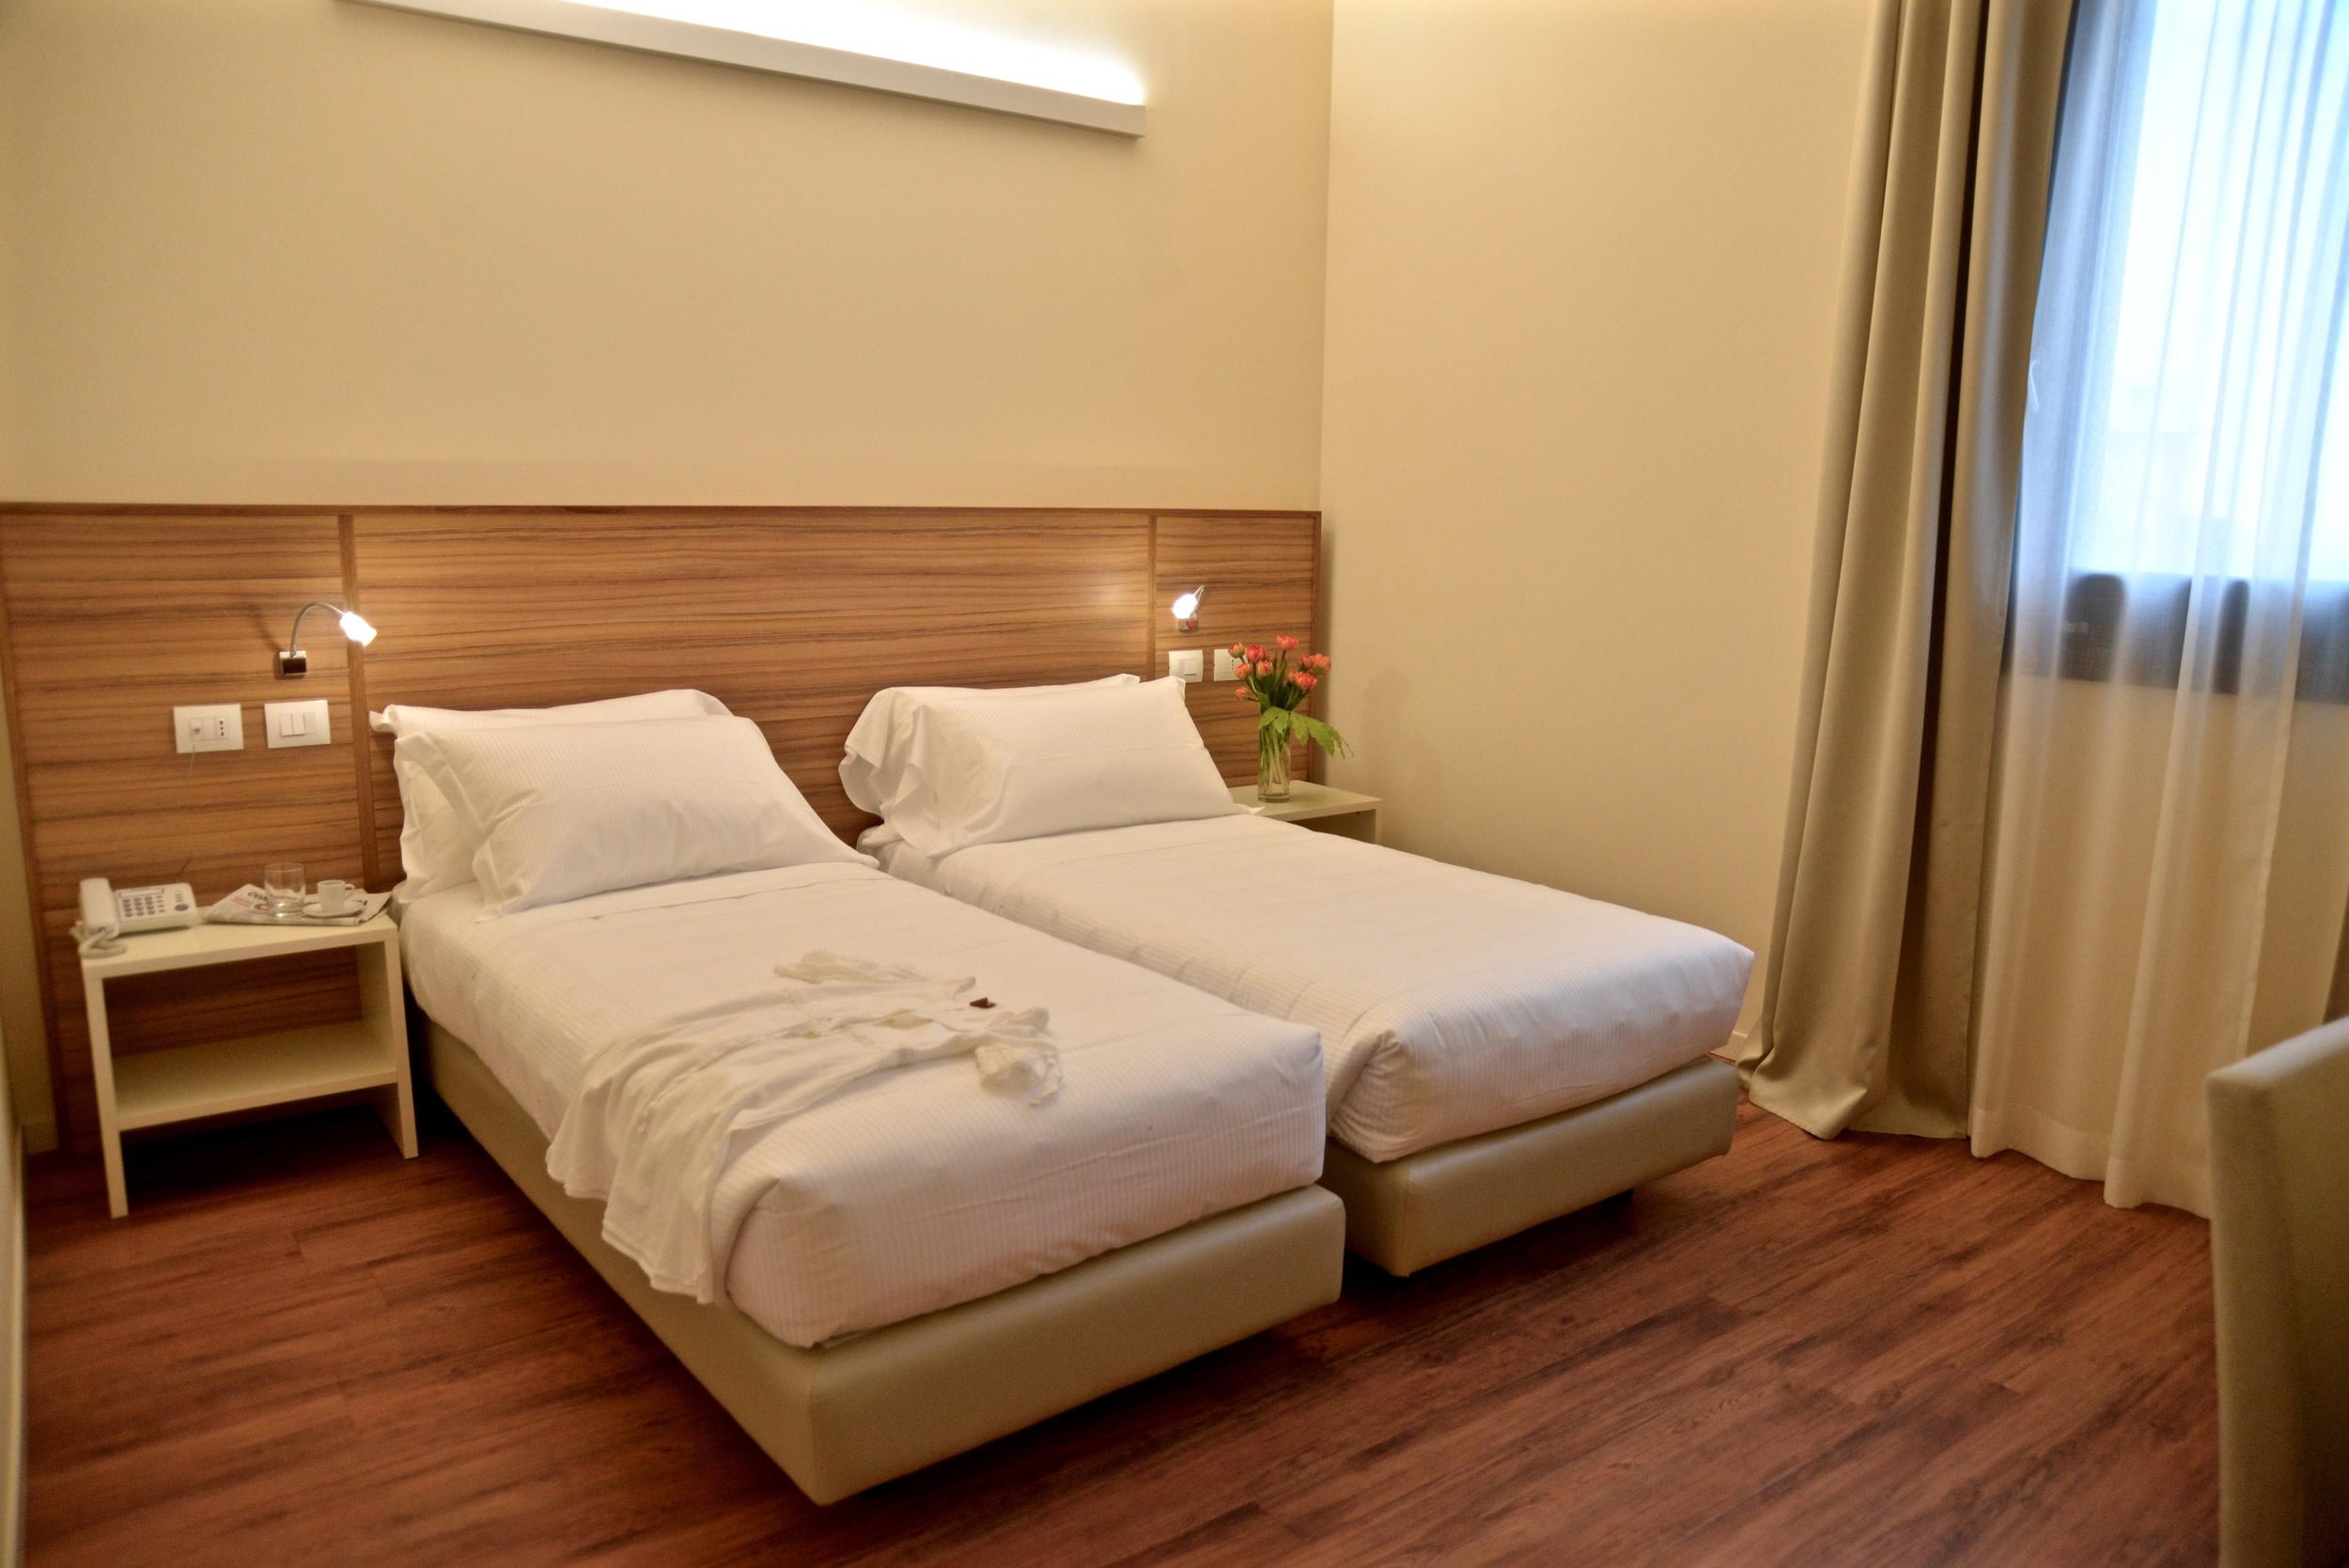 chambre lits jumeaux hotel forum milano. Black Bedroom Furniture Sets. Home Design Ideas